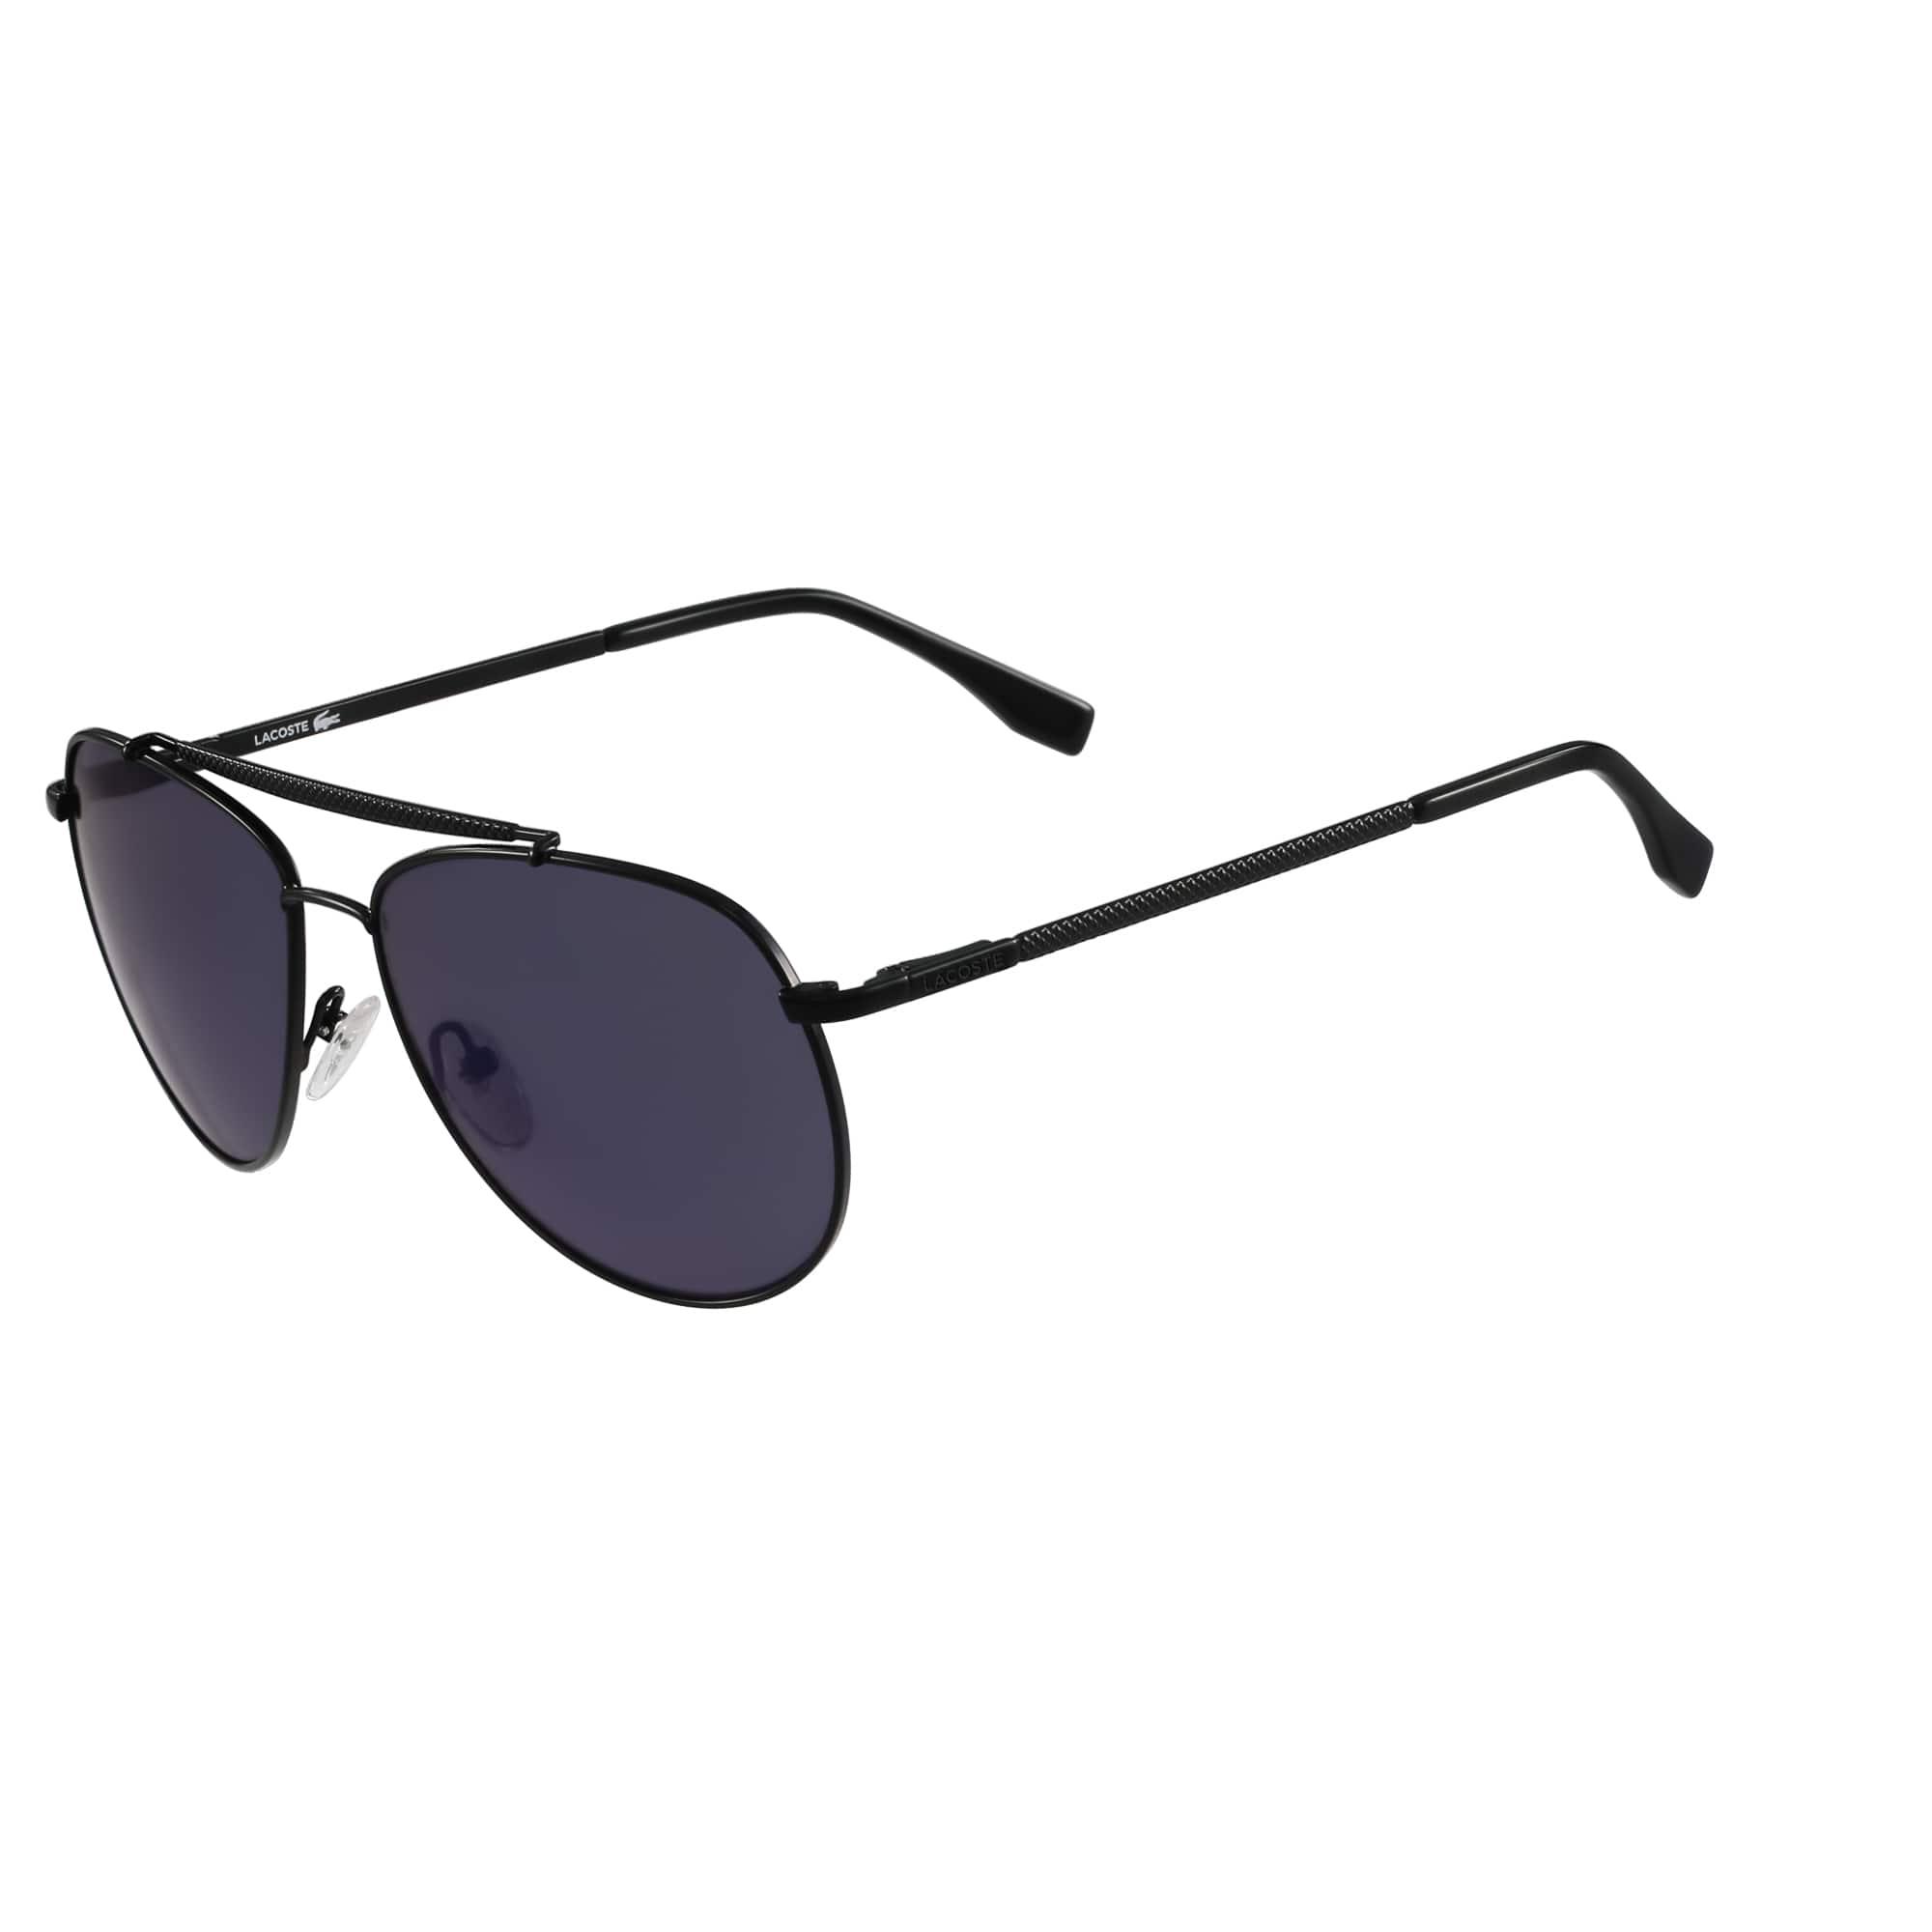 271b25b24db Sunglasses for Women